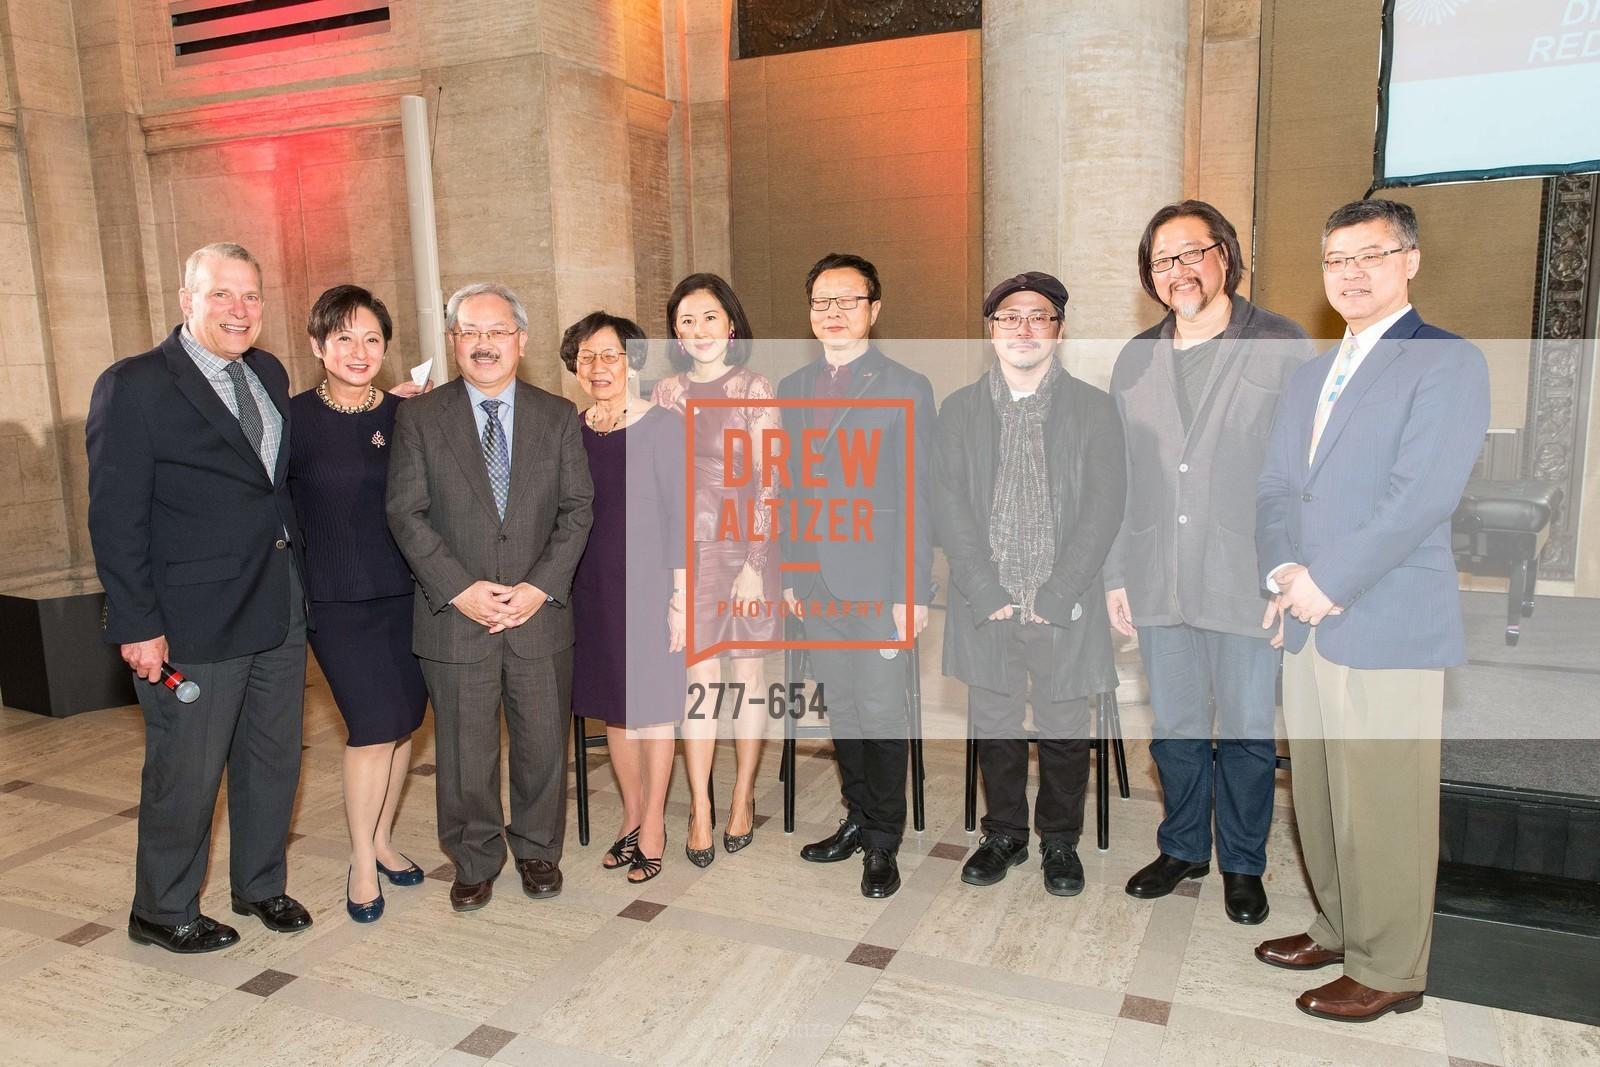 David Gockley, Doreen Woo Ho, Ed Lee, Pearl Bergad, Gorretti Lo Lui, Bright Sheng, Tim Yip, Stan Lai, Jay Xu, San Francisco Opera Celebrates